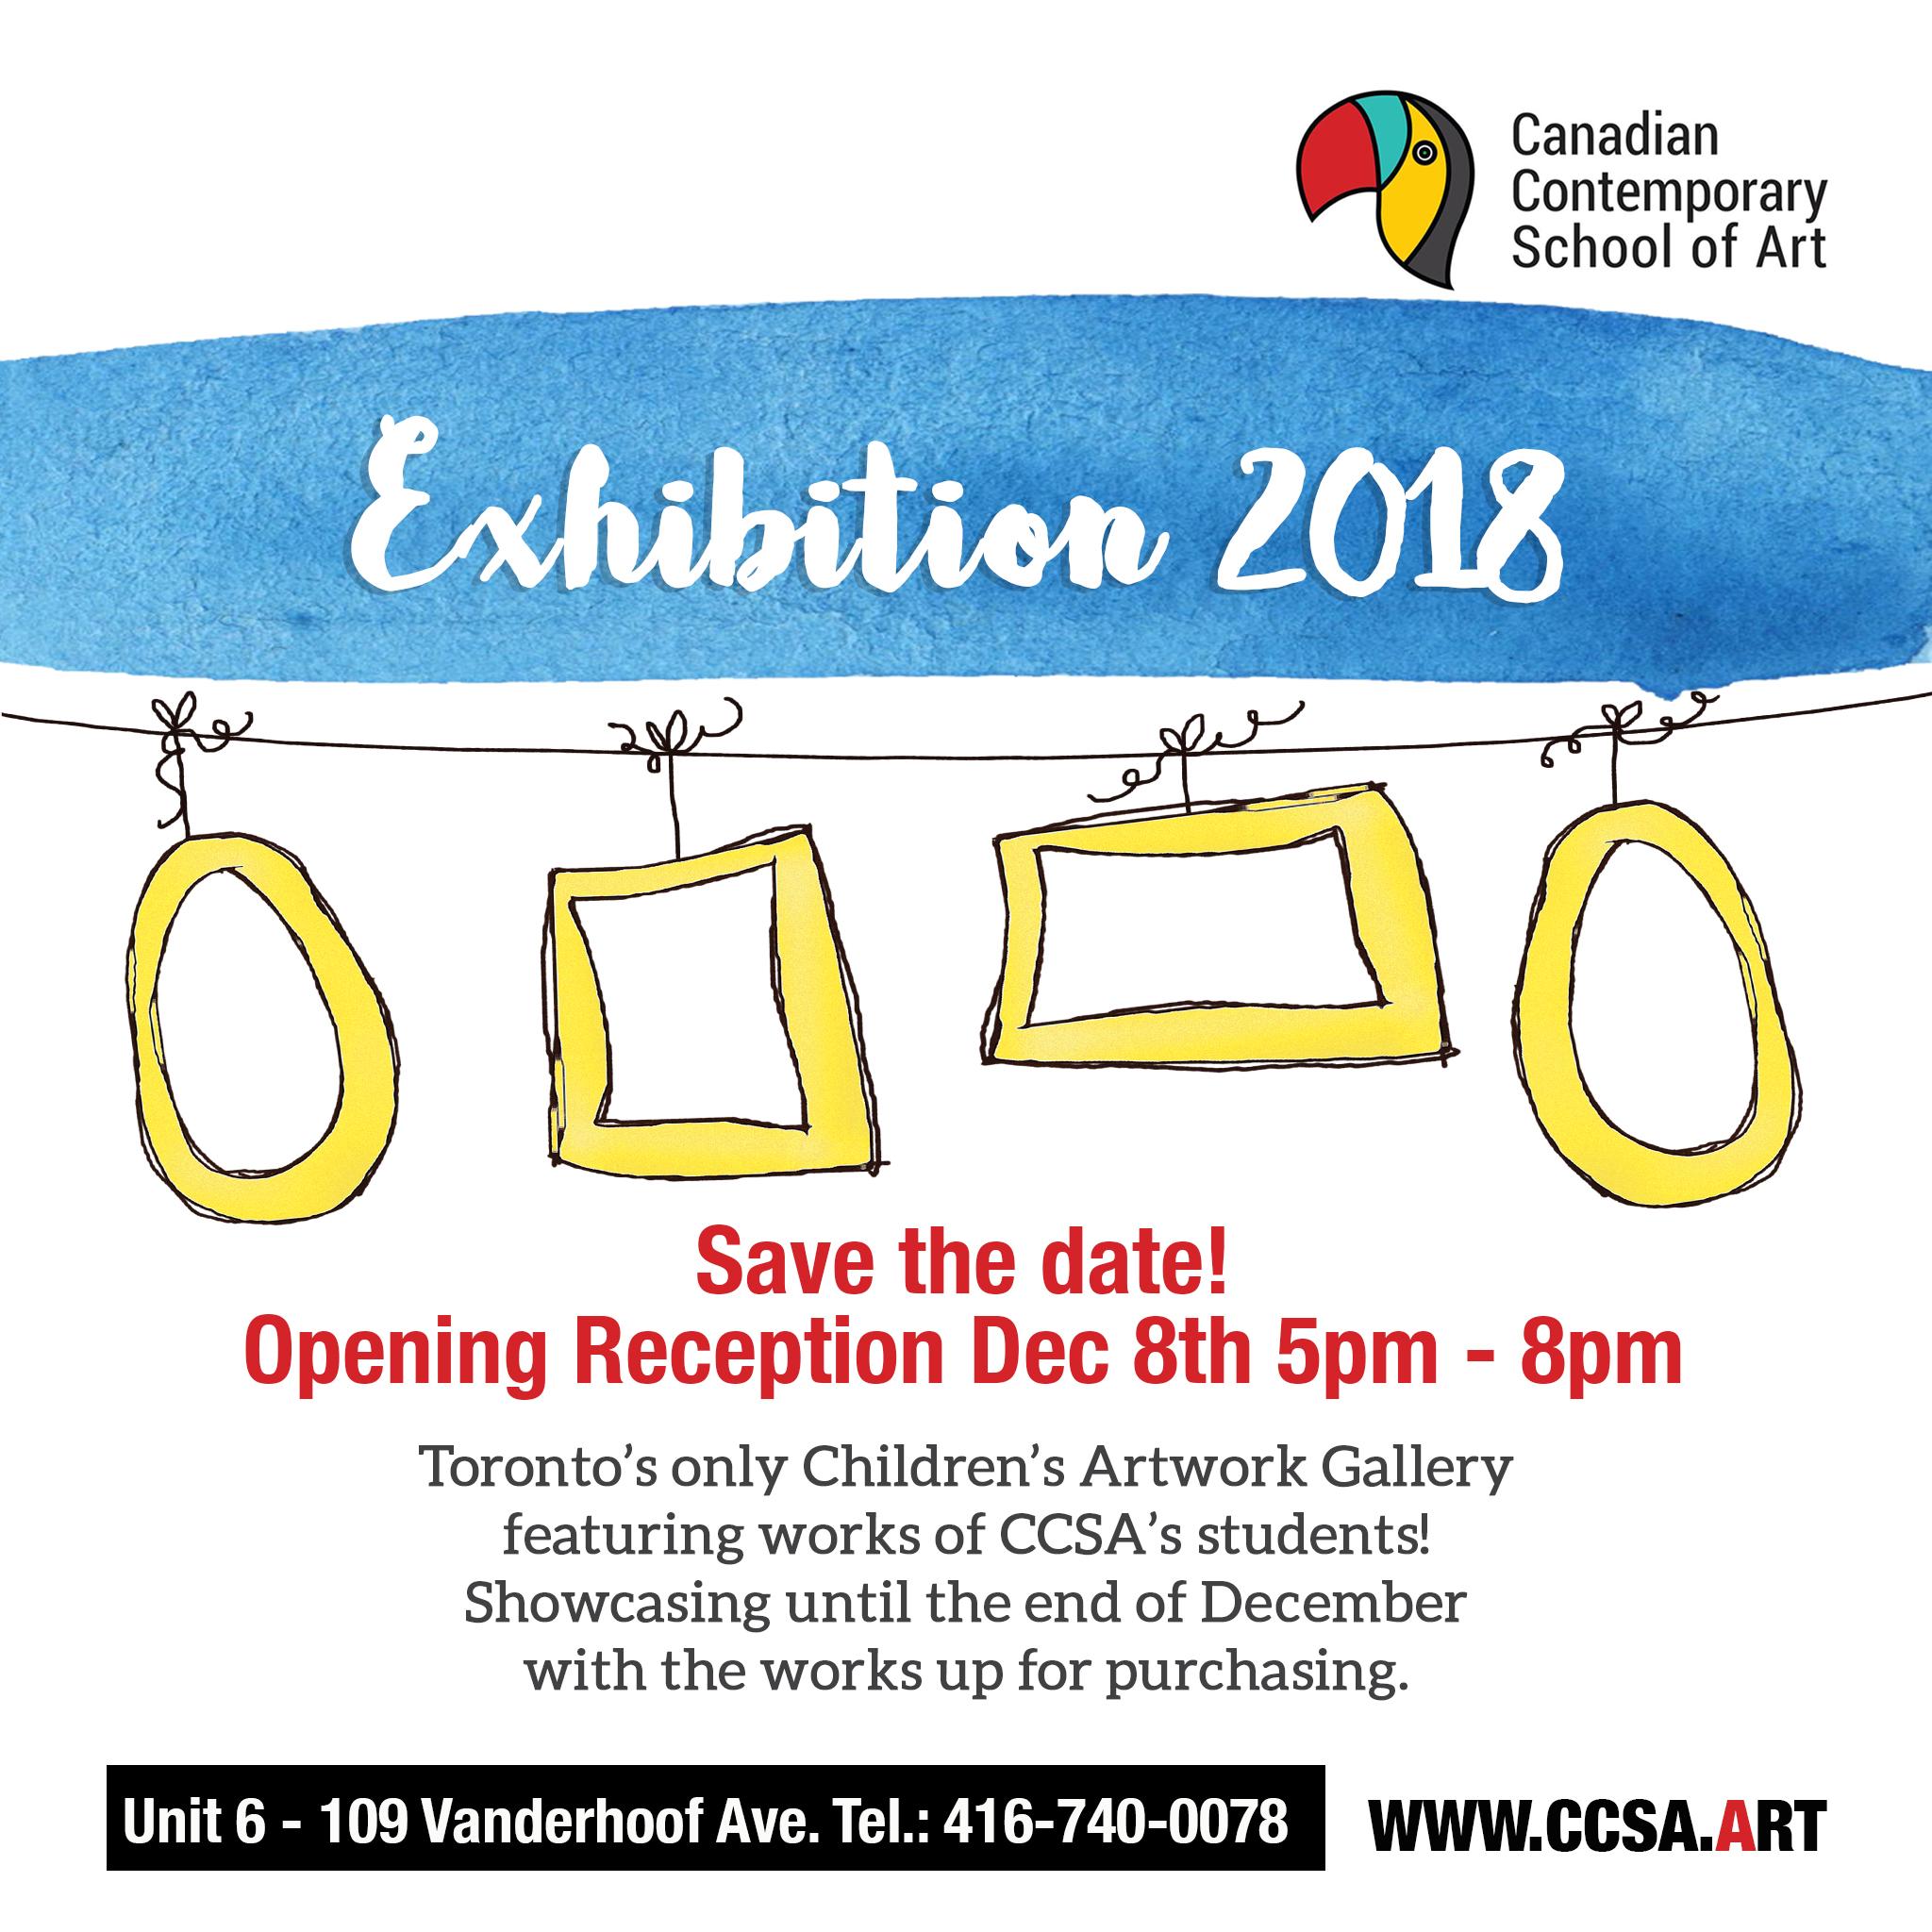 Exhibition 2018.jpg